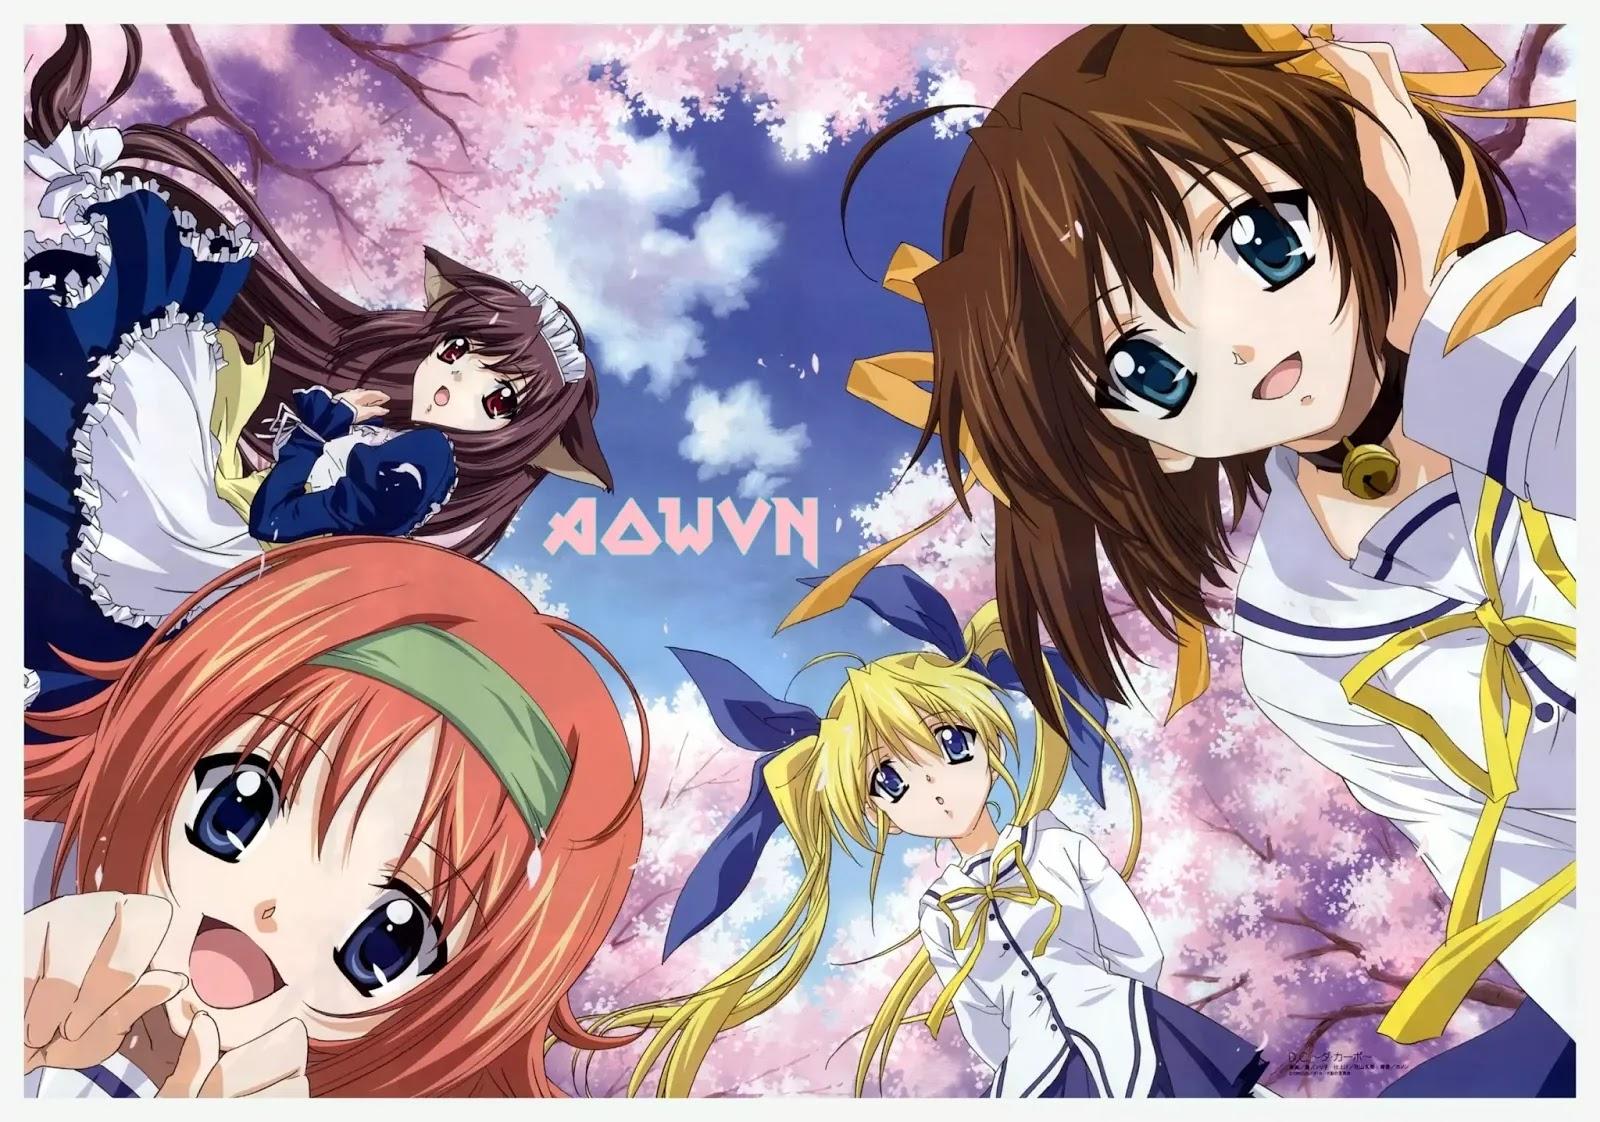 AowVN%2B%25282%2529 - [ Anime 3gp Mp4 ] Da Capo SS1 + SS2 + SS3 + OVA + Special | Vietsub Harem Tình yêu Huyền thoại